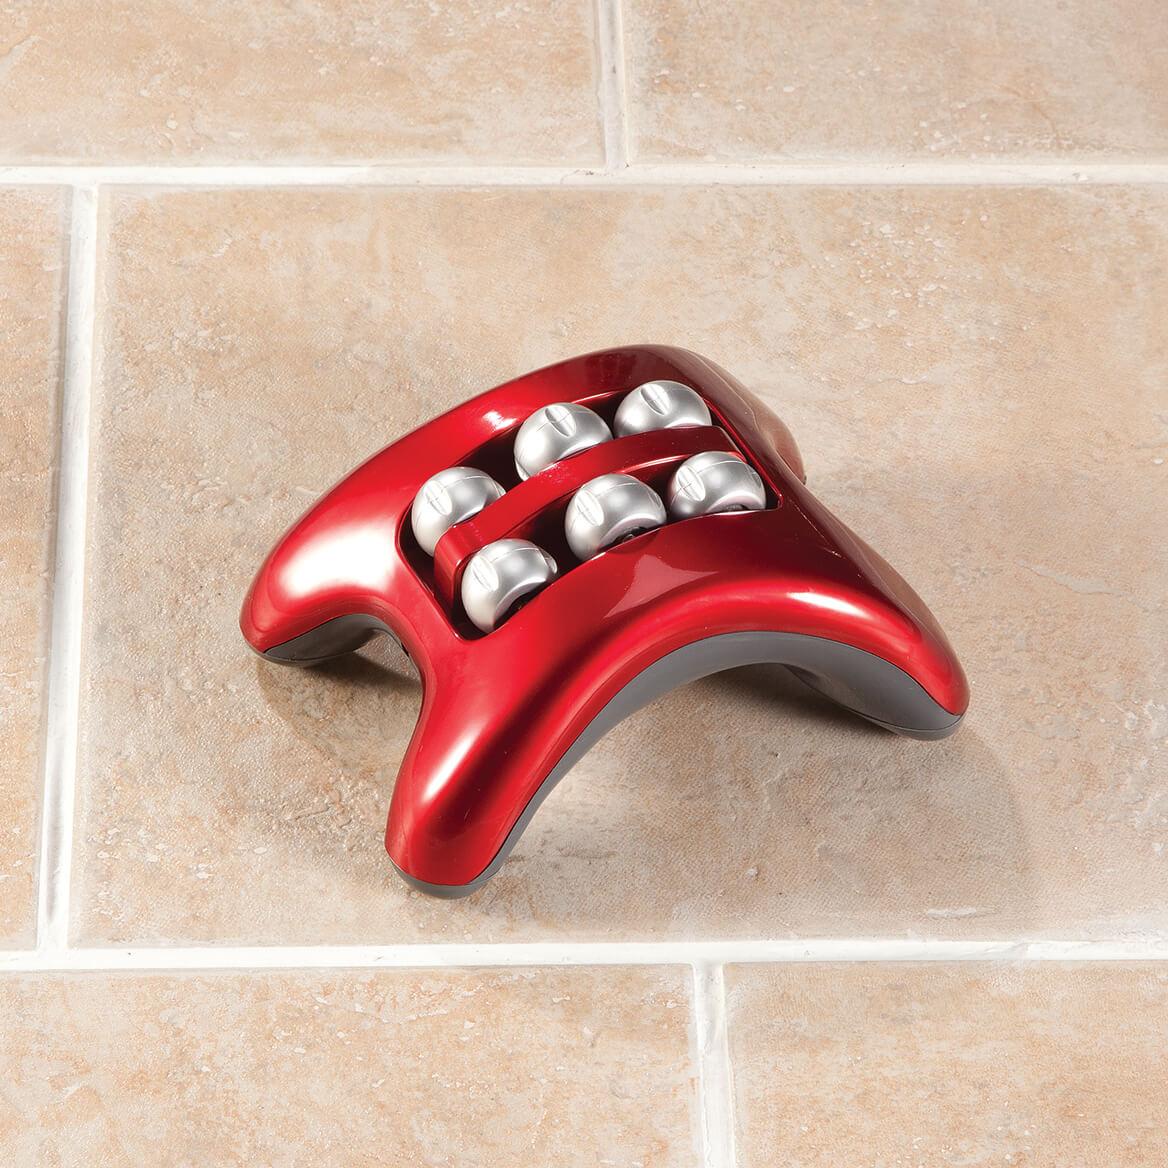 Vibrating Foot Massager-359996